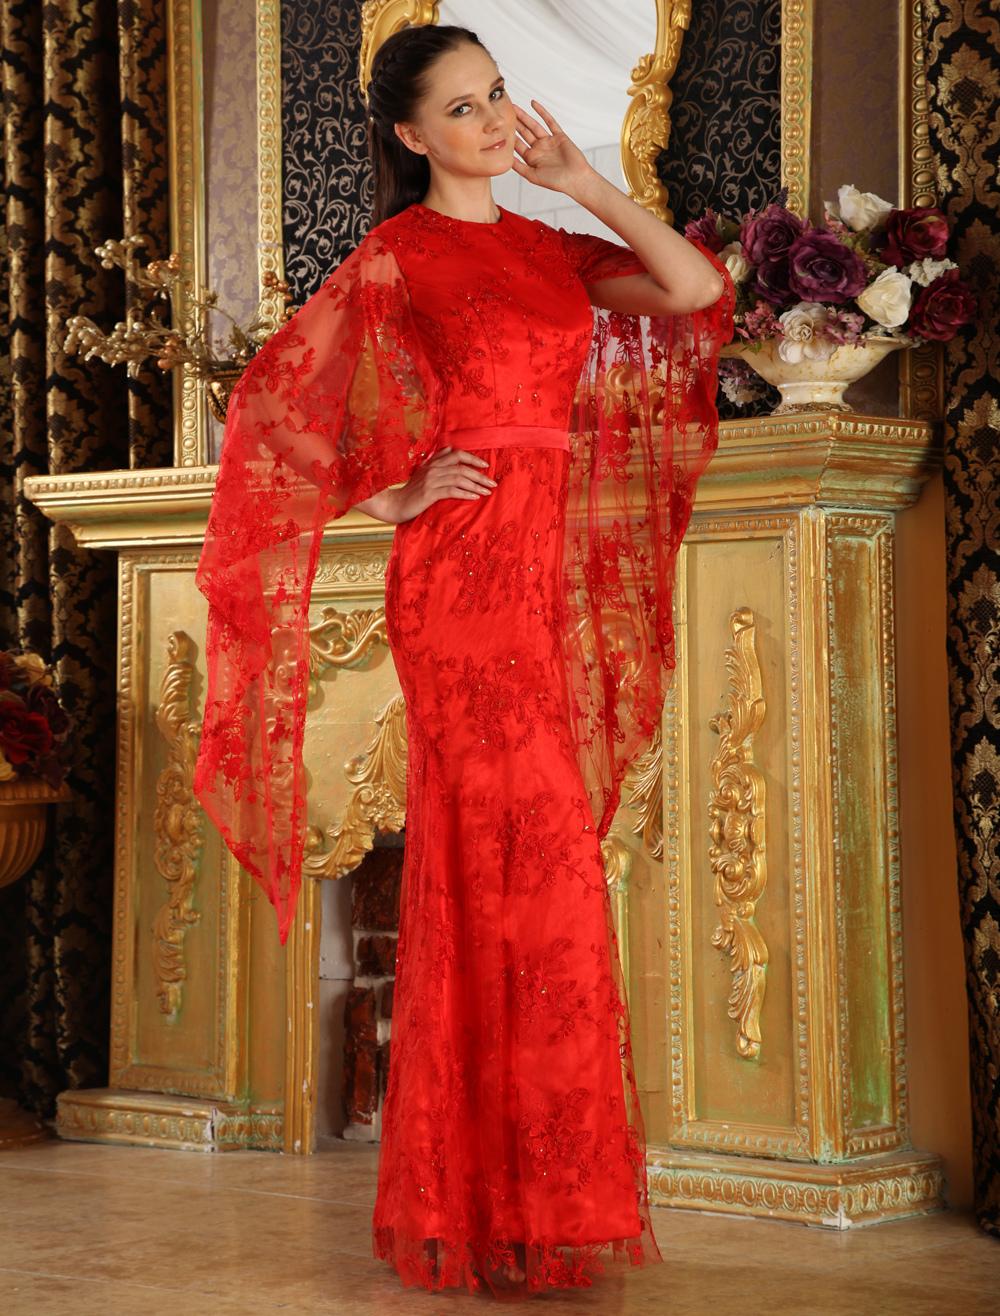 Floor Length Lace Evening Dress (Wedding Evening Dresses) photo